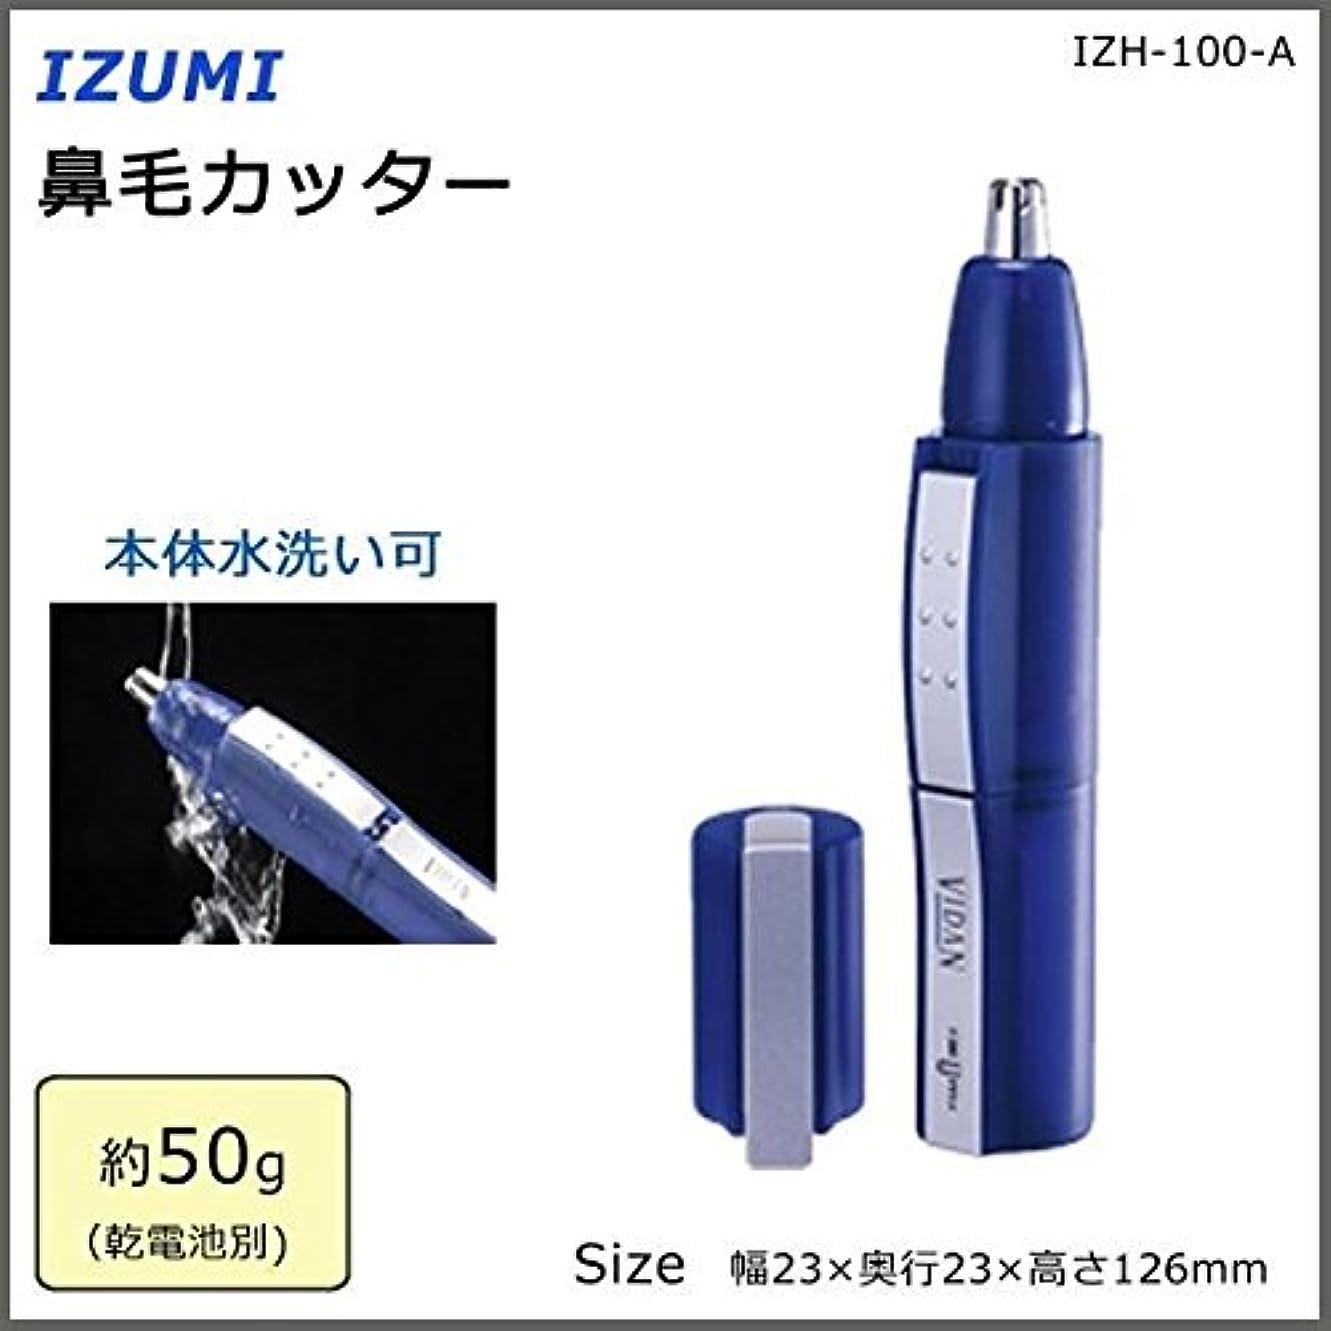 鏡音声学抽象化IZUMI 鼻毛カッター IZH-100-A